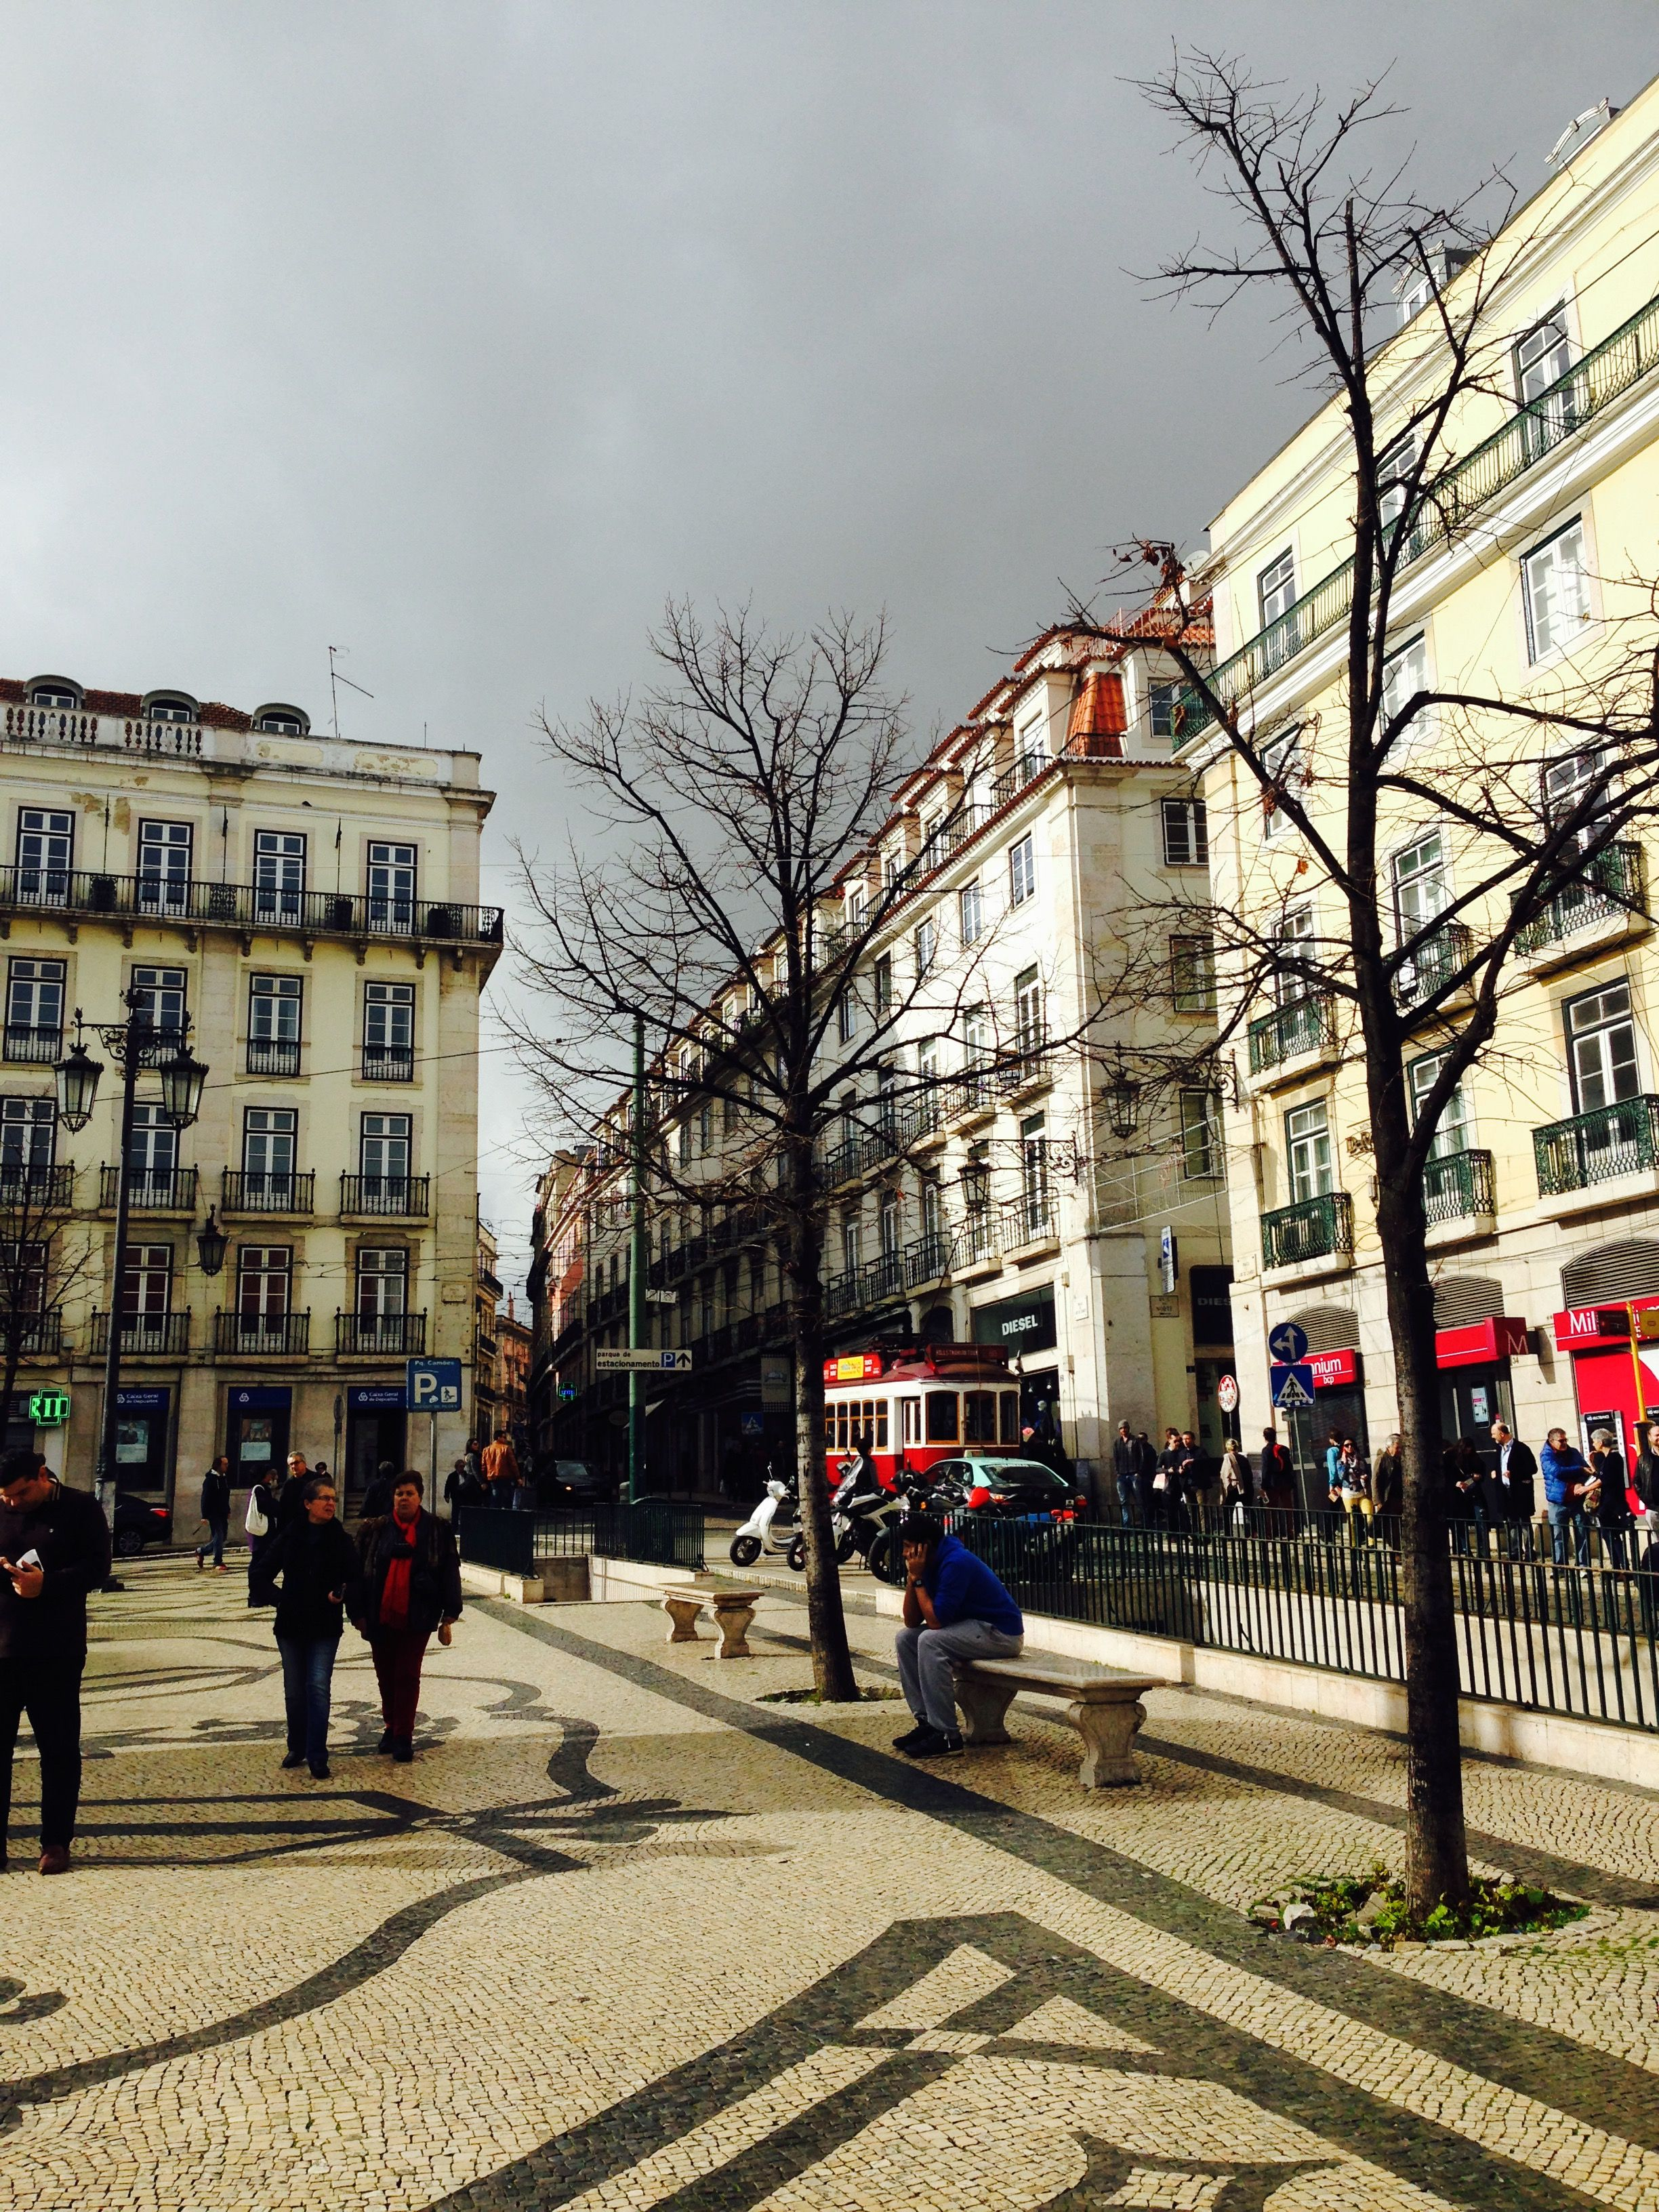 Lisboa, Portugal photo / mfpineiro